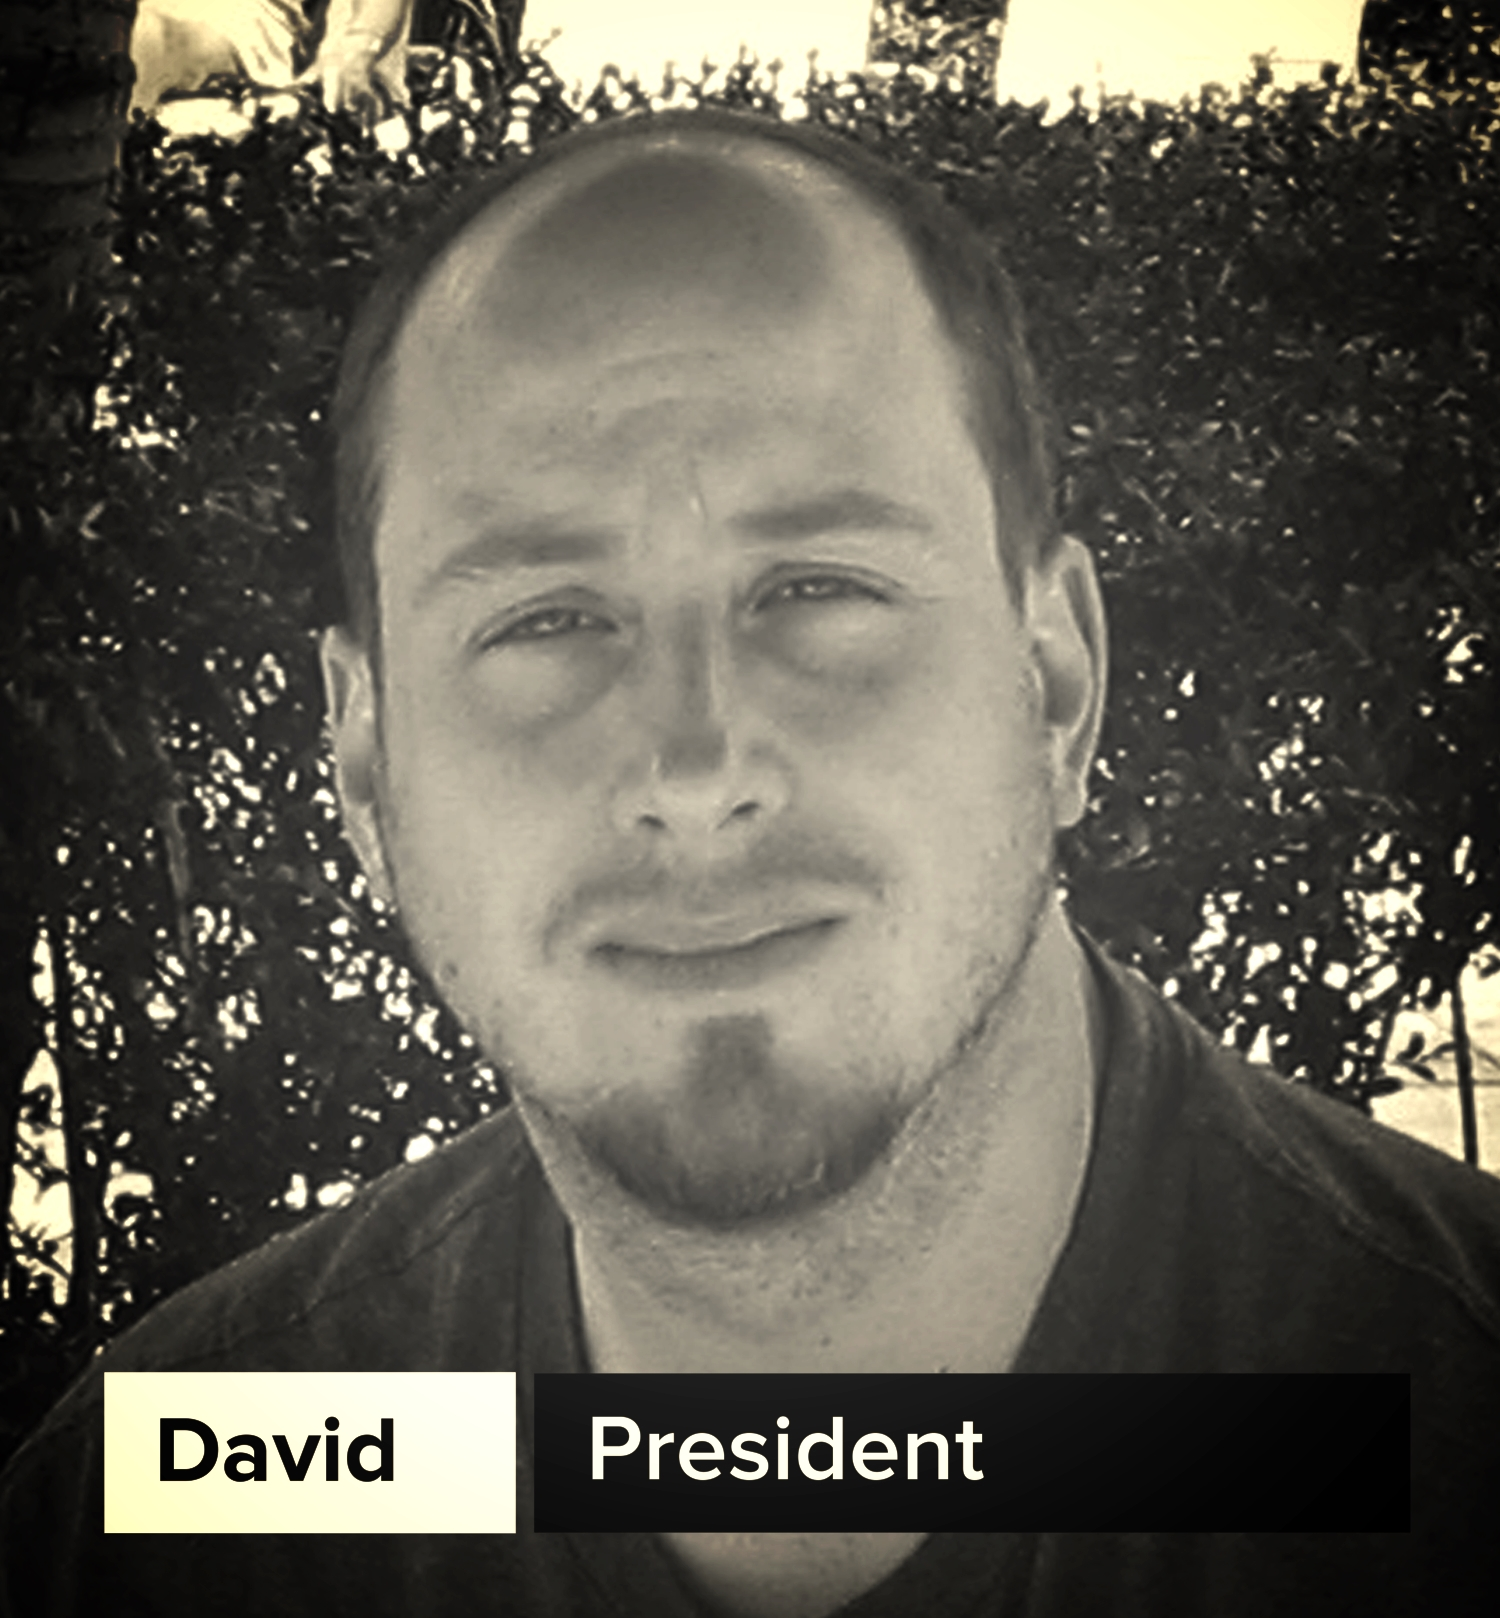 David_BW_Title.jpg